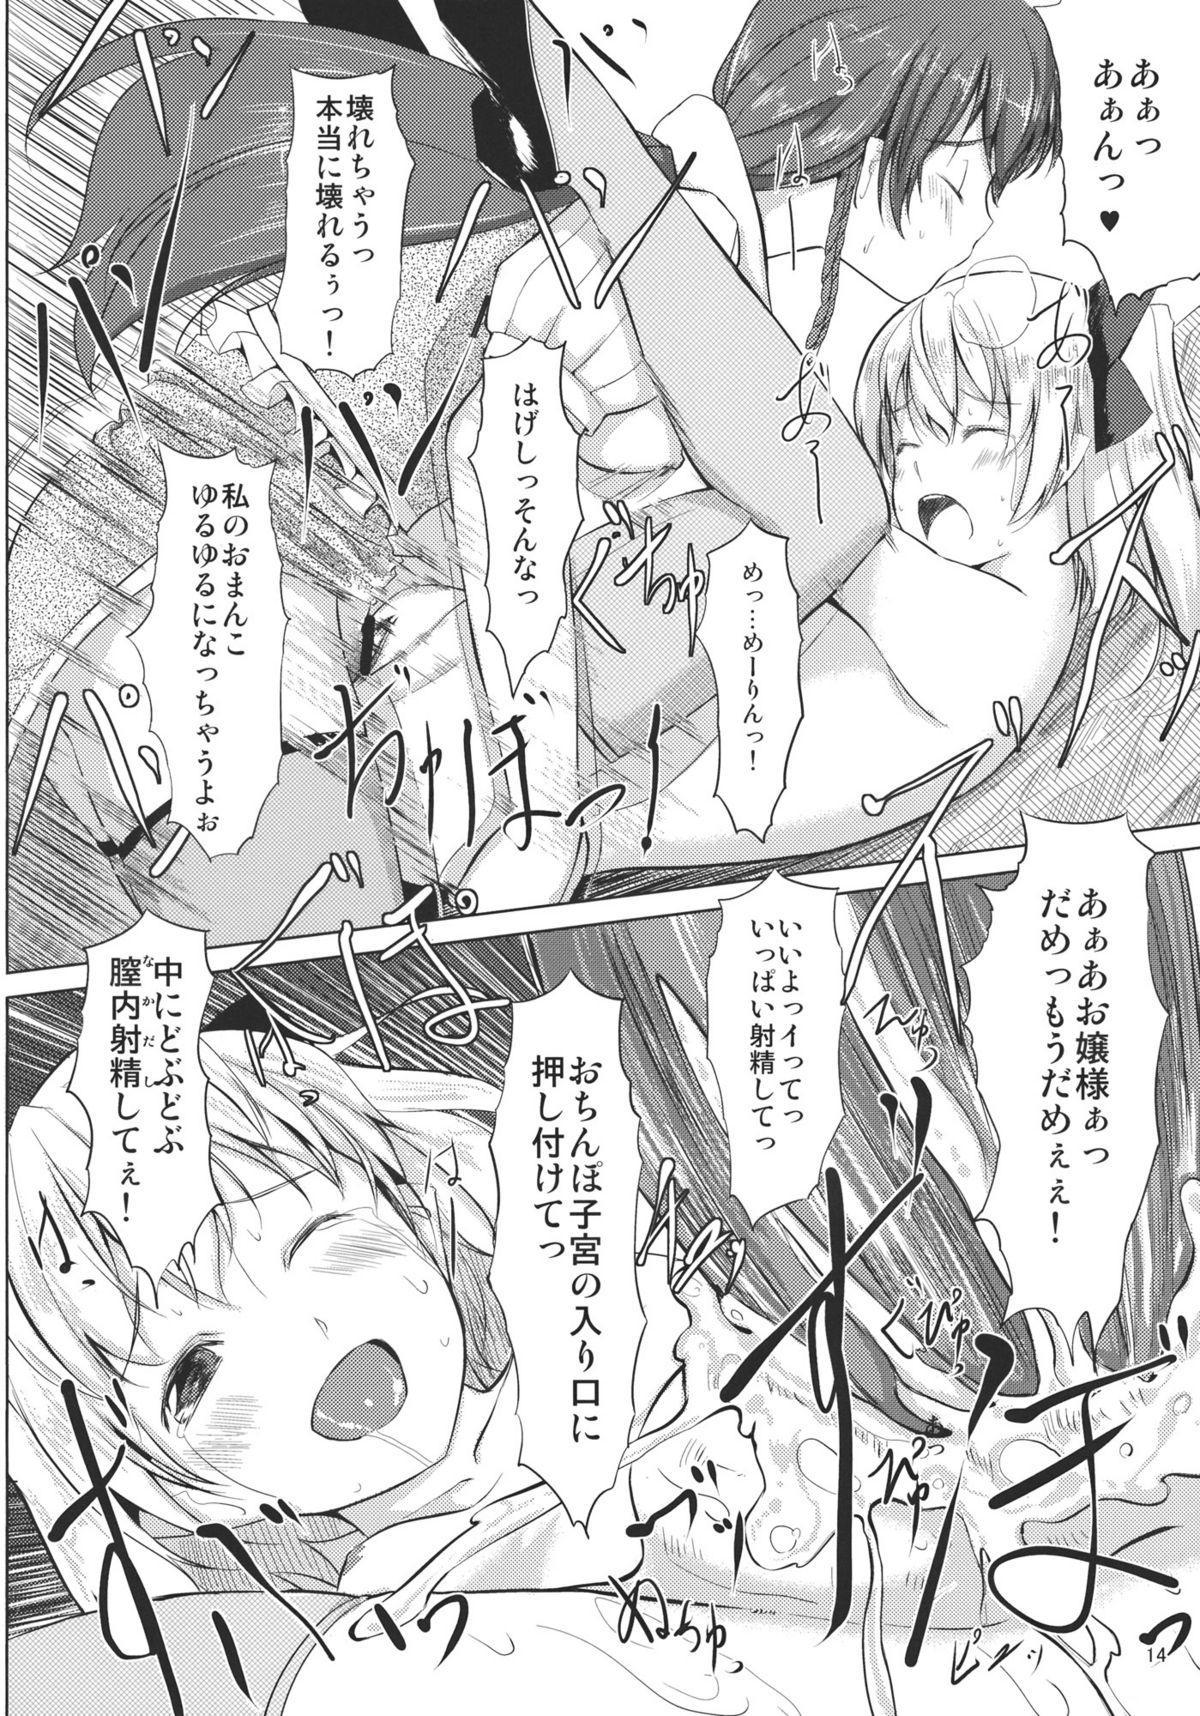 Flan-chan Infinity 15